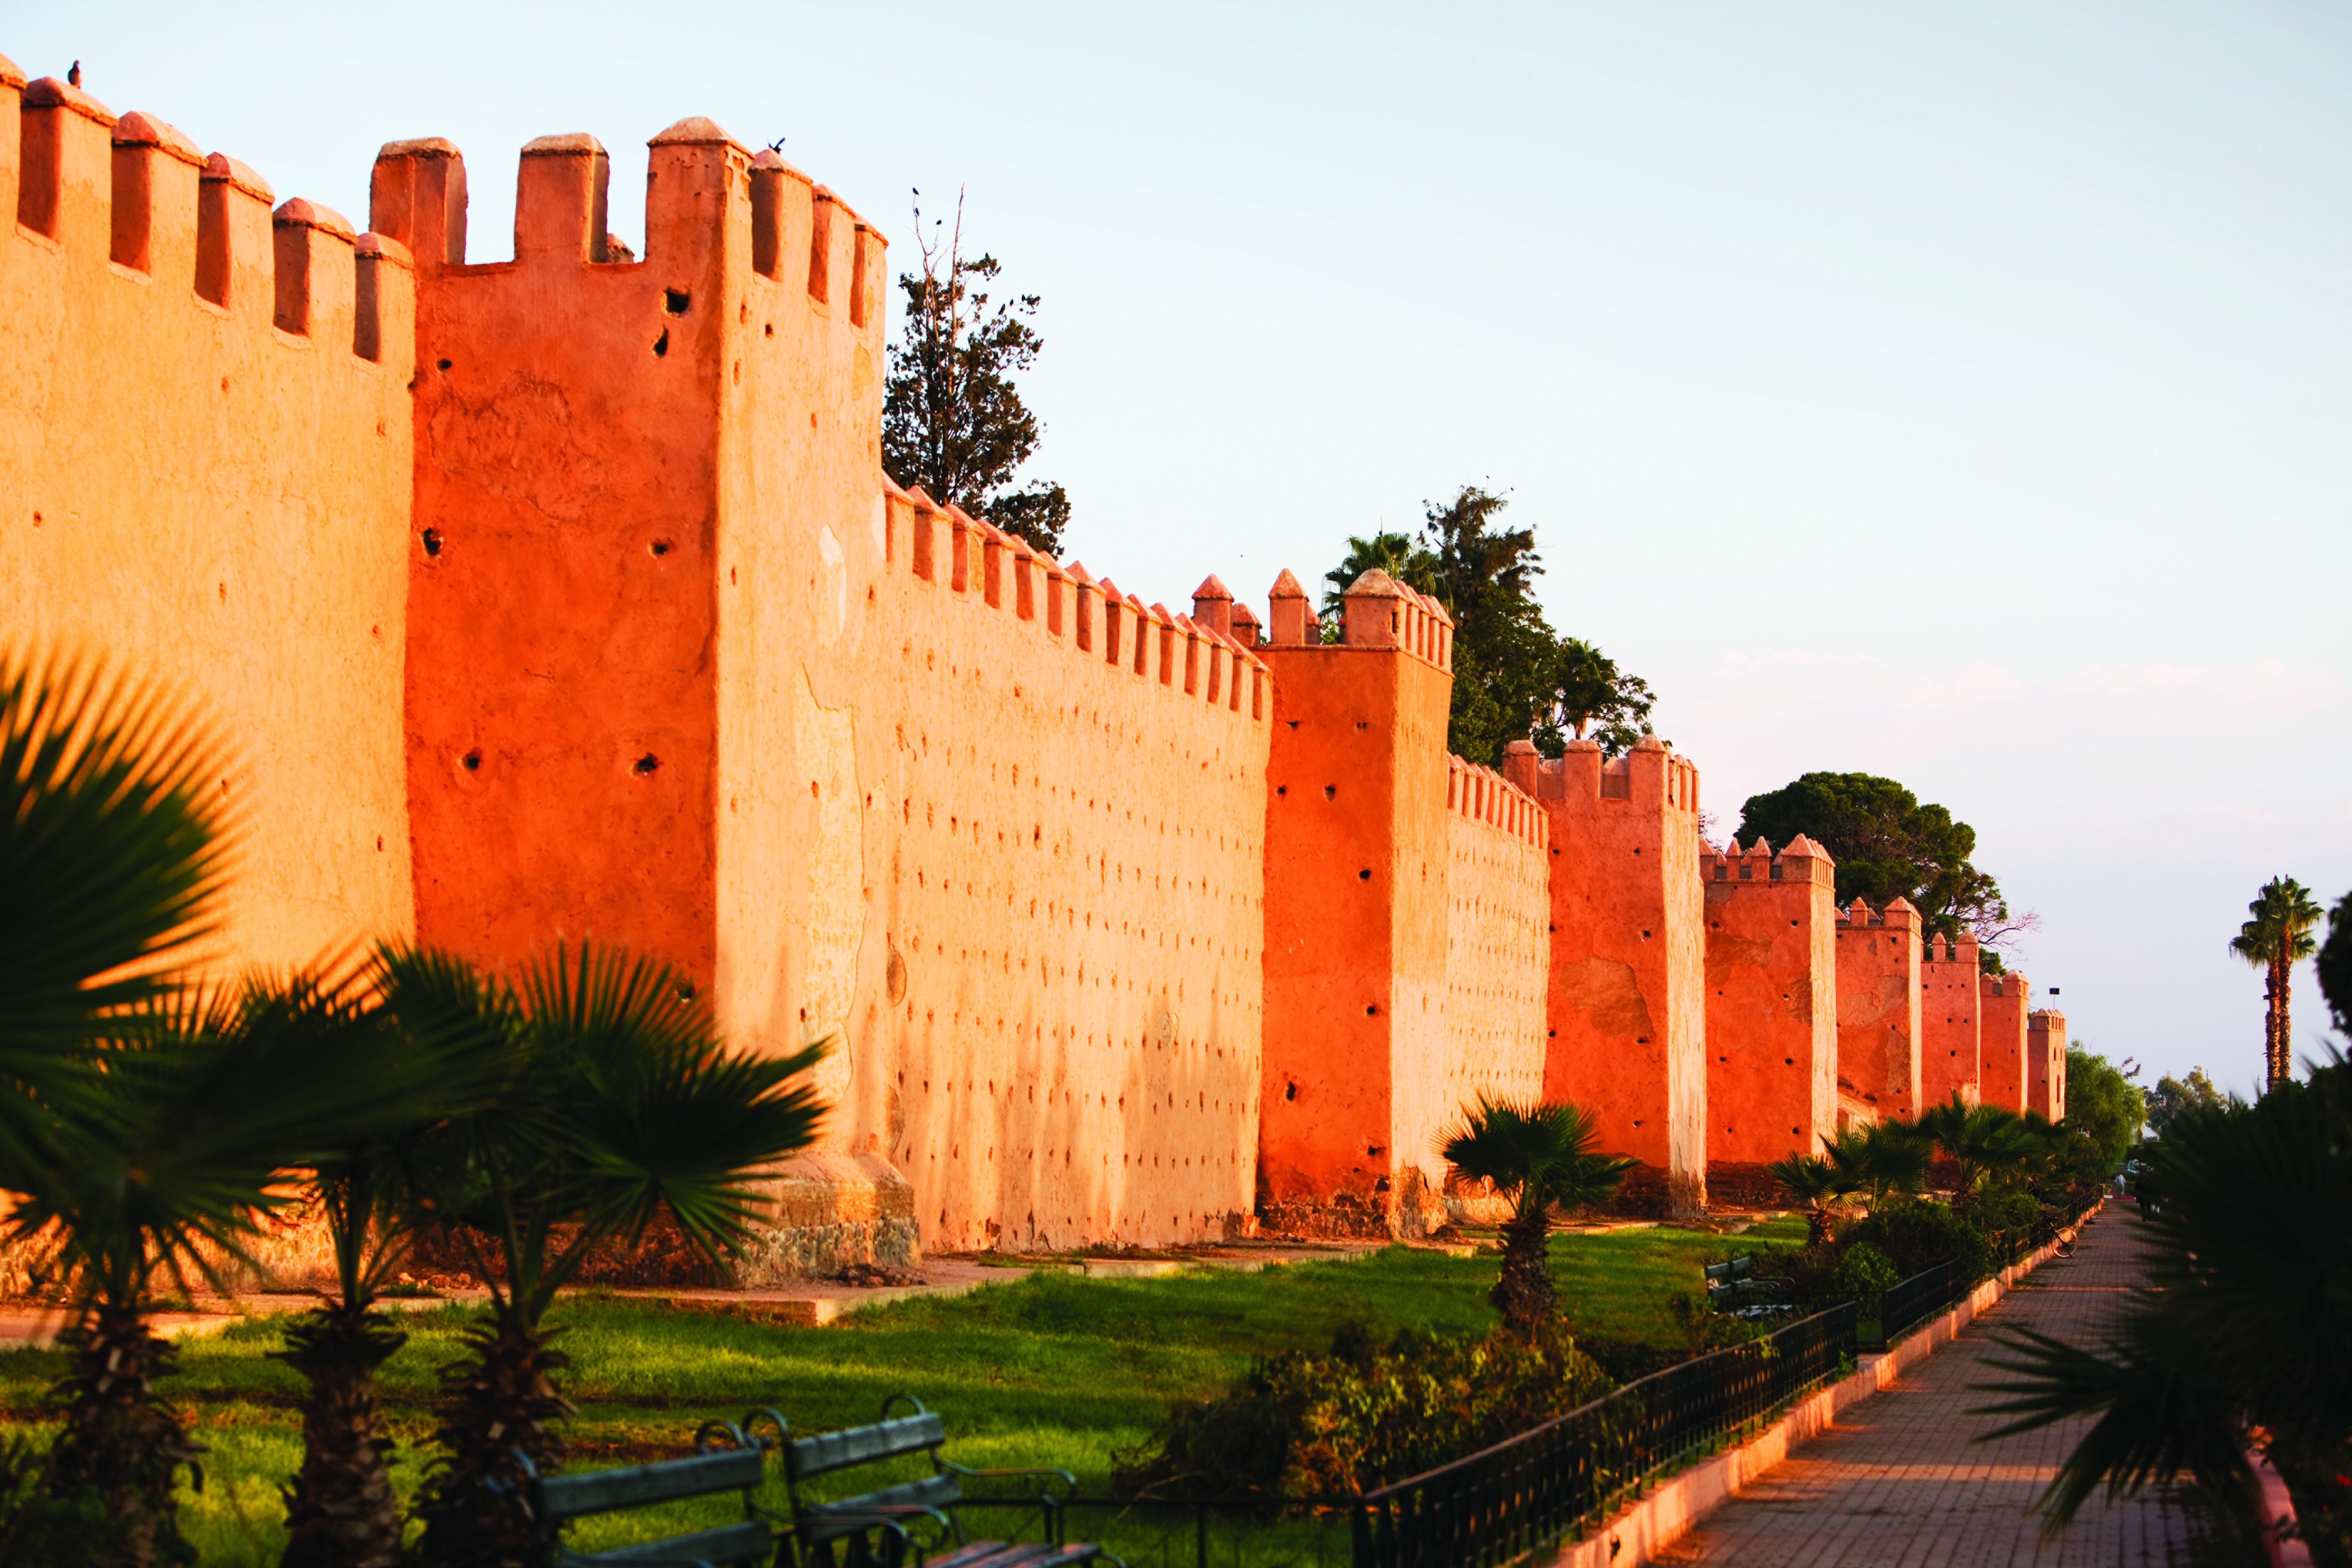 marrakech-city-walls-ochre